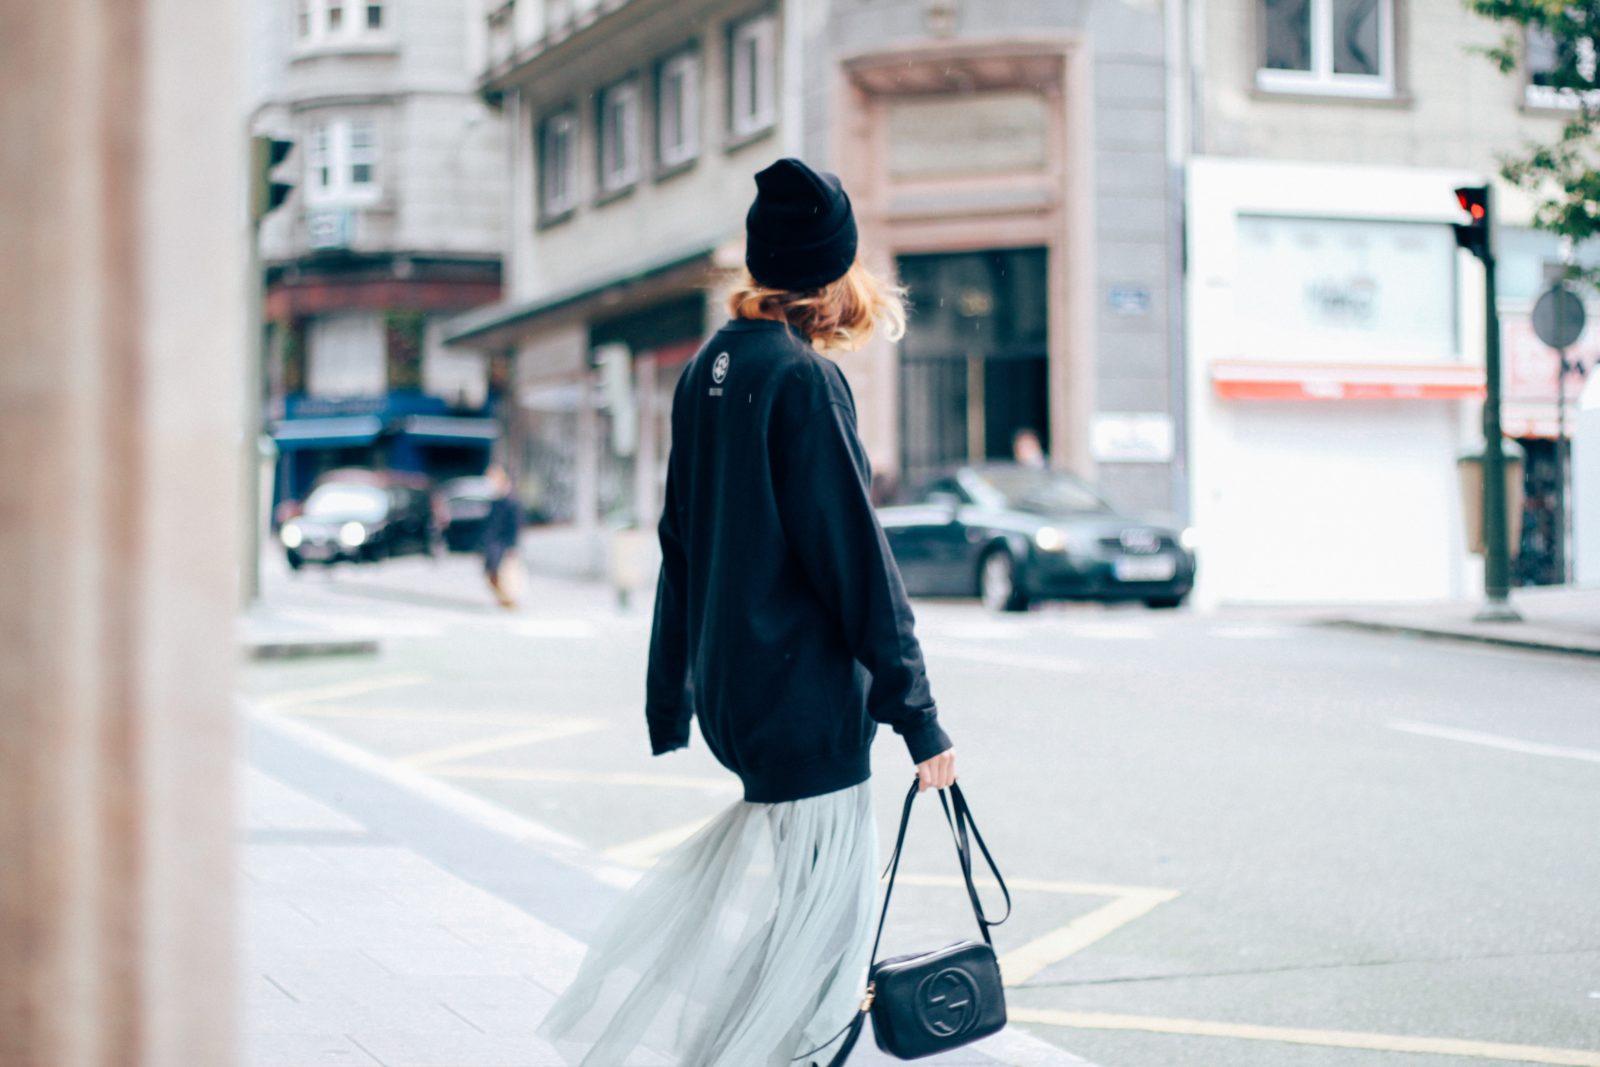 sudadera_old_dogs_falda_de_tul_vans_beanie_carhartt_look_donkeycool_street_style-18